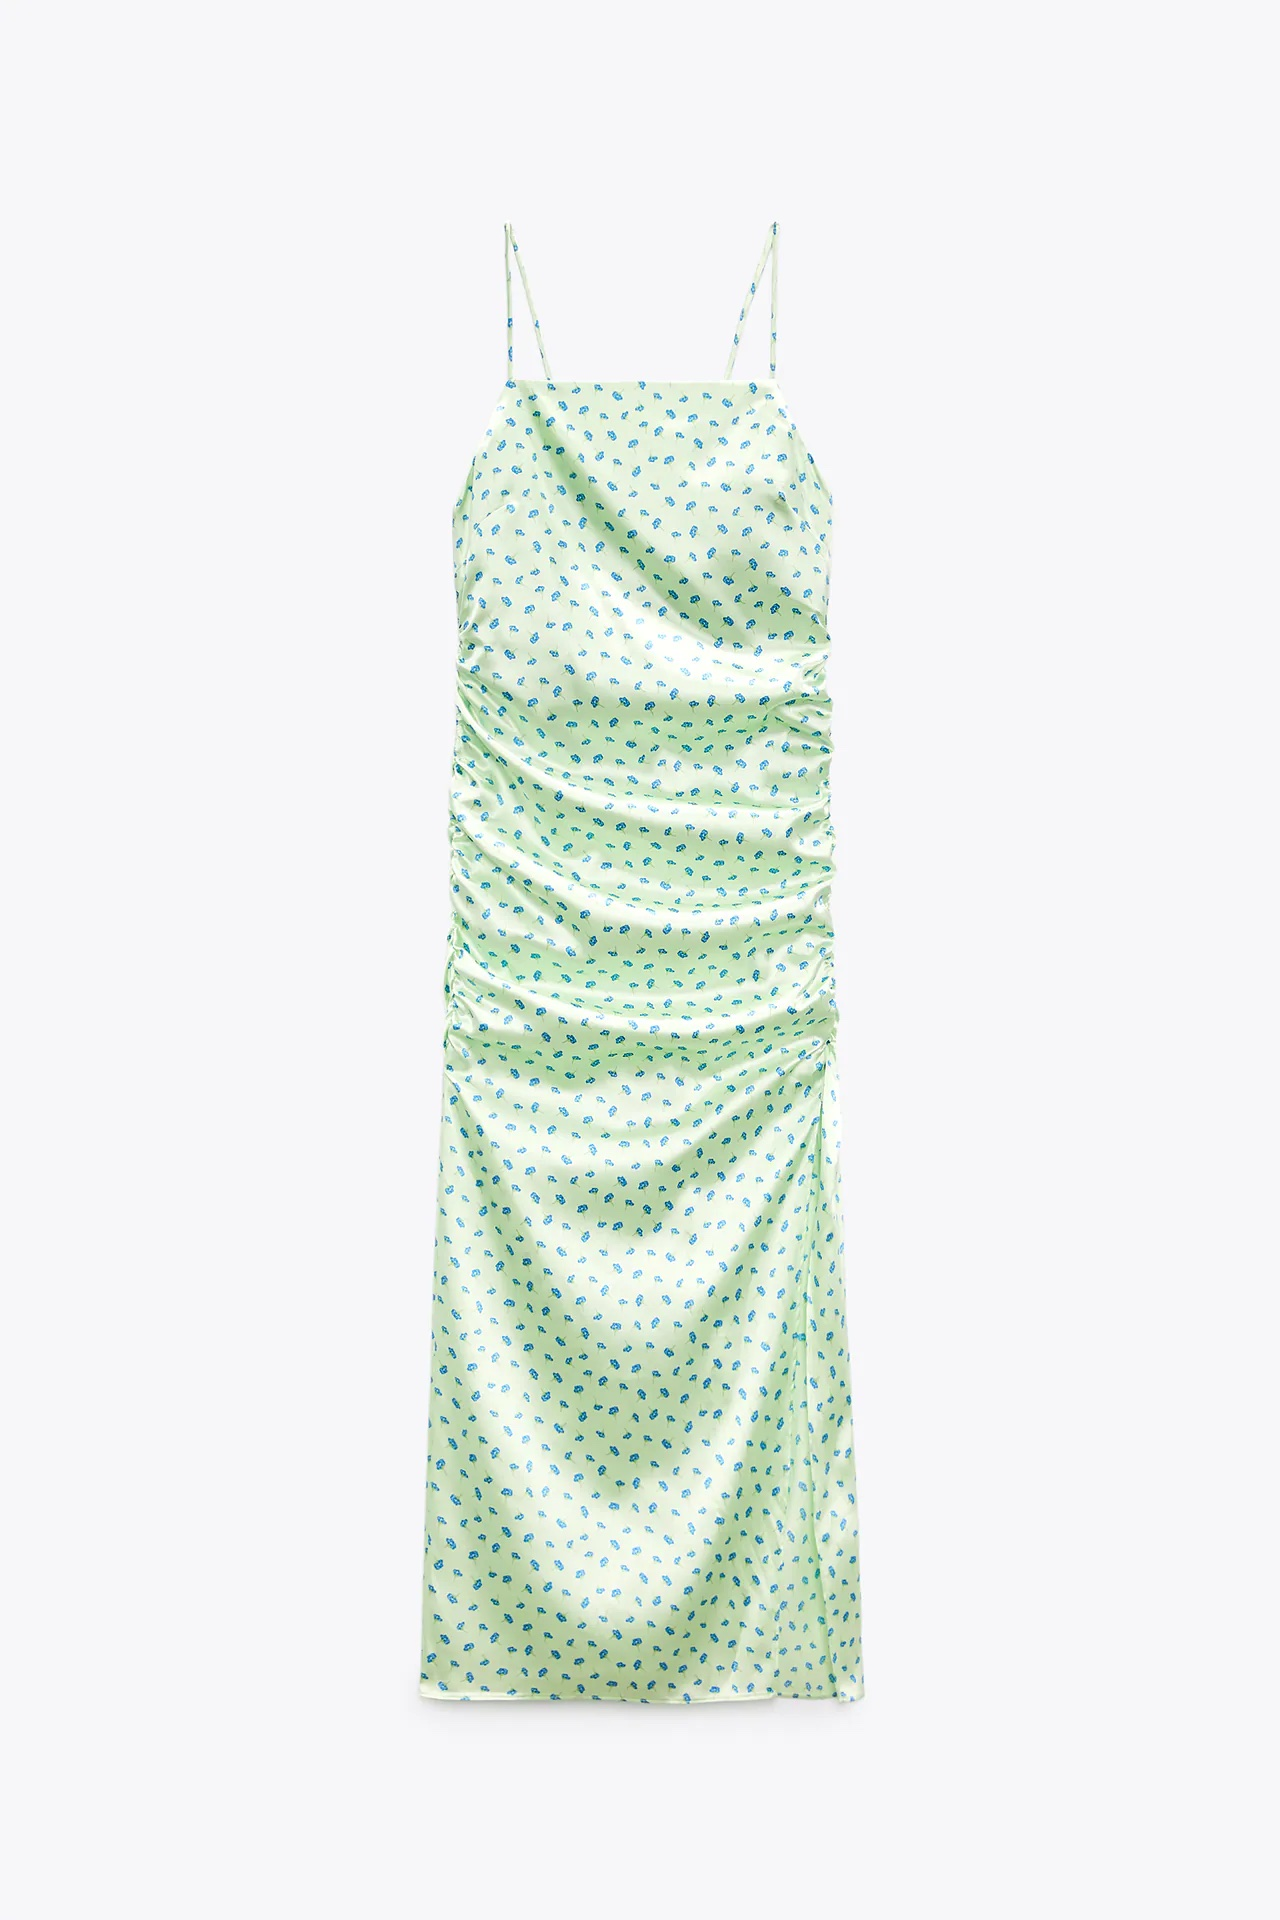 zara spring collection dress